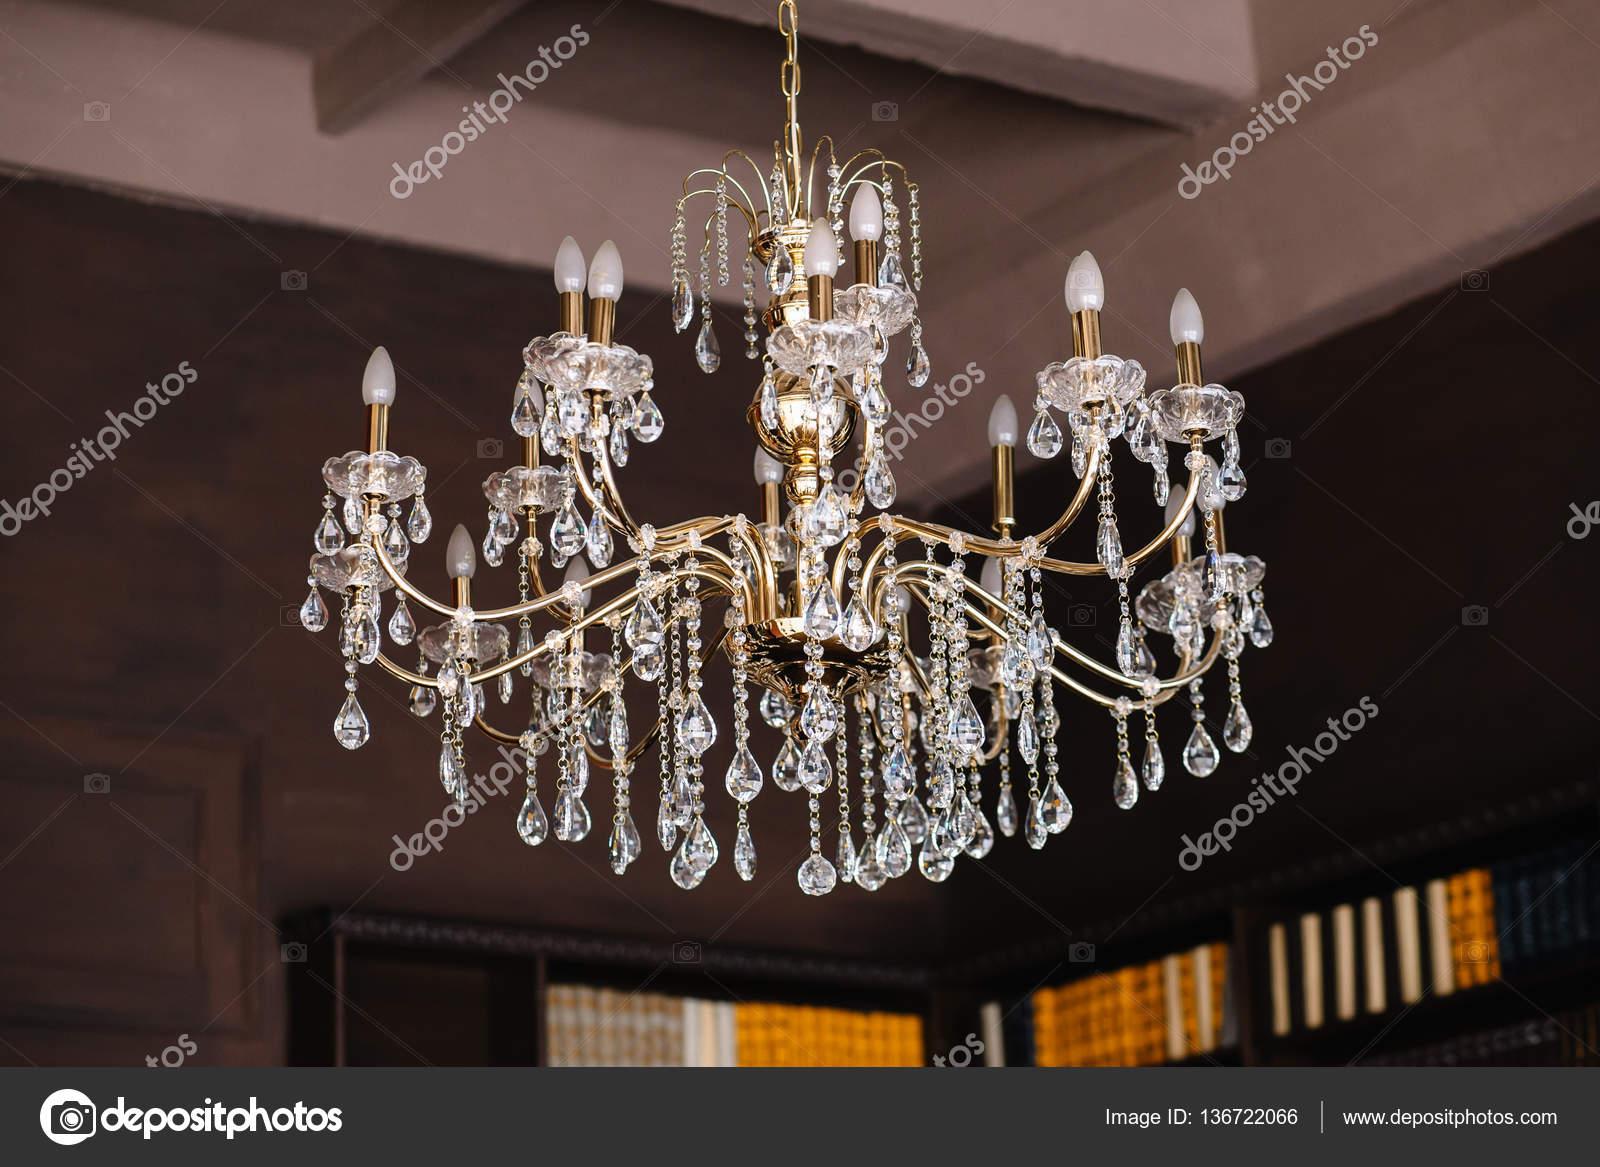 Kristall Perlen Kronleuchter ~ Gold kronleuchter mit perlen verziert u stockfoto pilgrimiracle